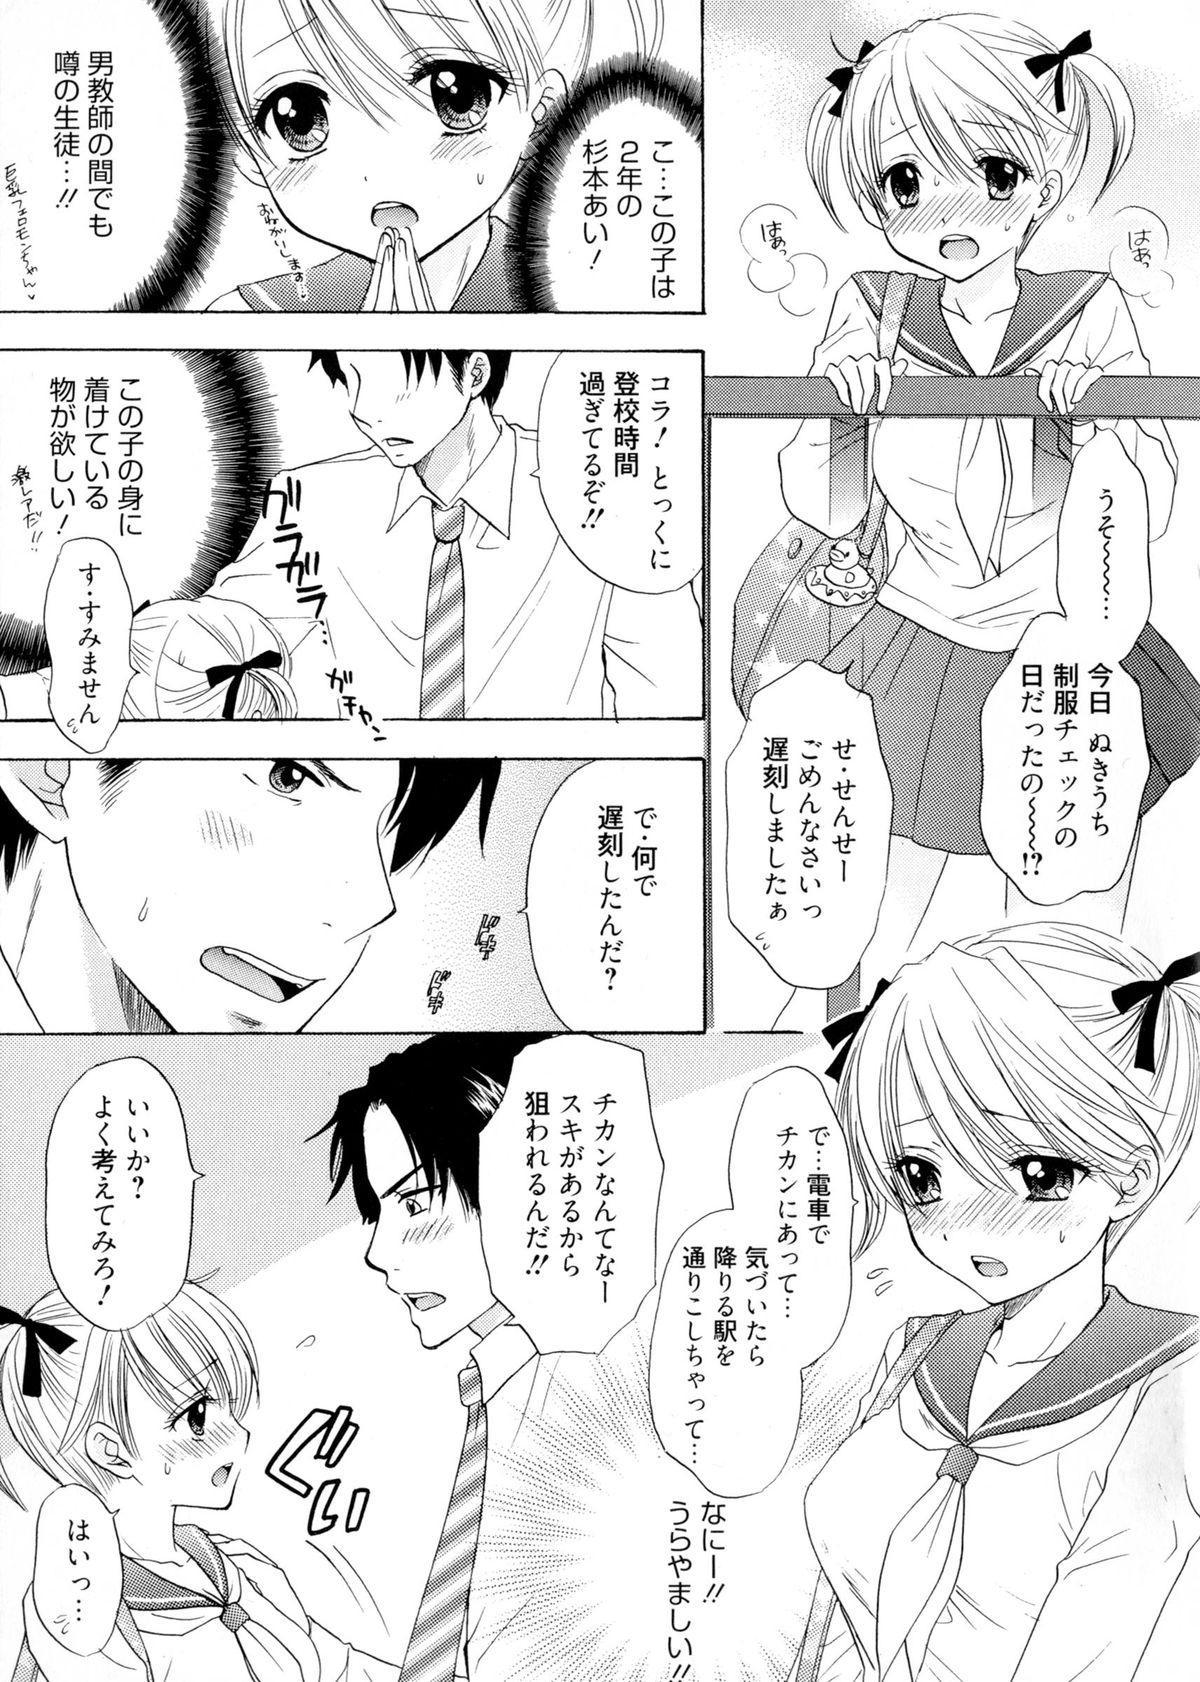 The Great Escape 4 Shokai Genteiban 6